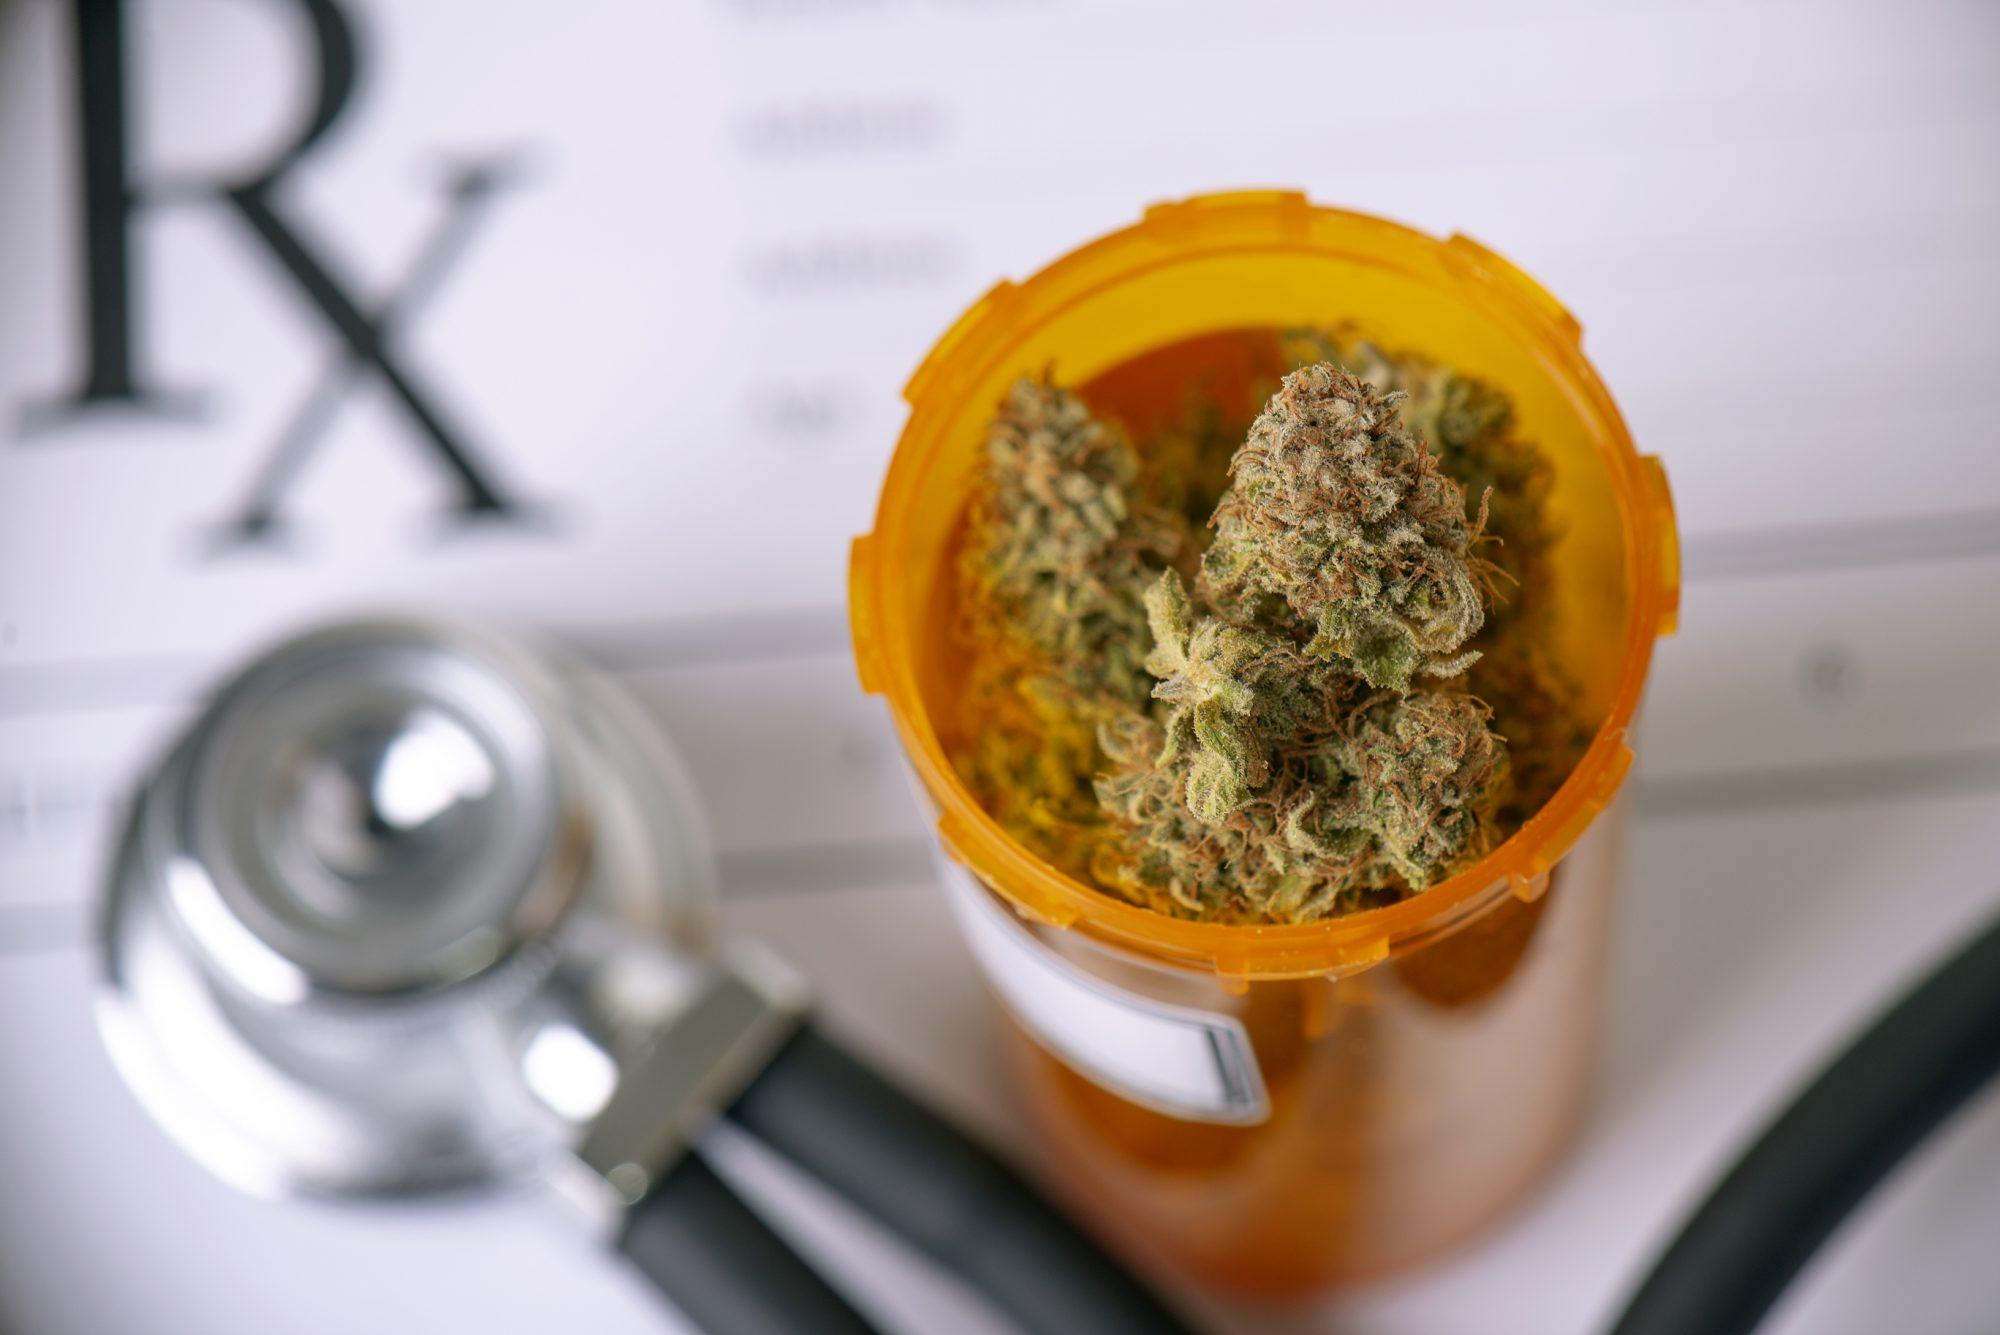 Using Medical Cannabis